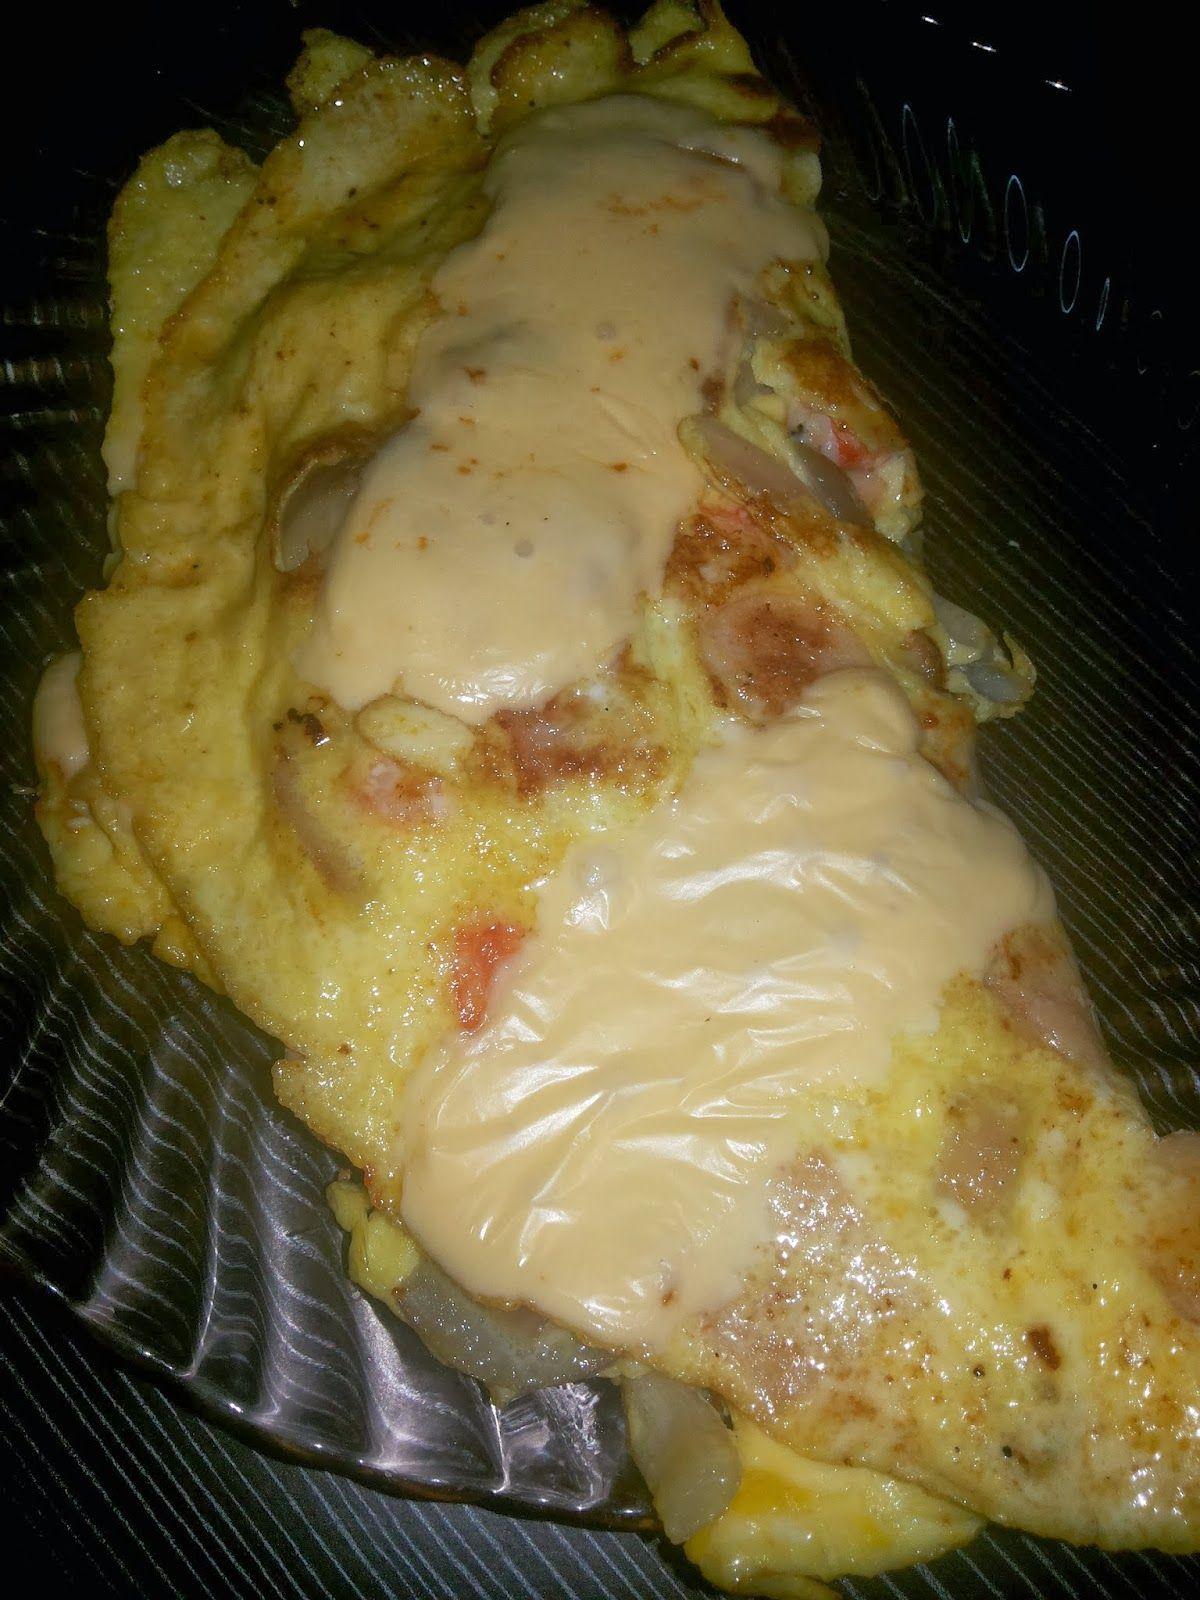 Corat Coret Nusha Resepi Mudah Sihat Telur Bungkus Cheese Food Diet Recipes Healthy Eating